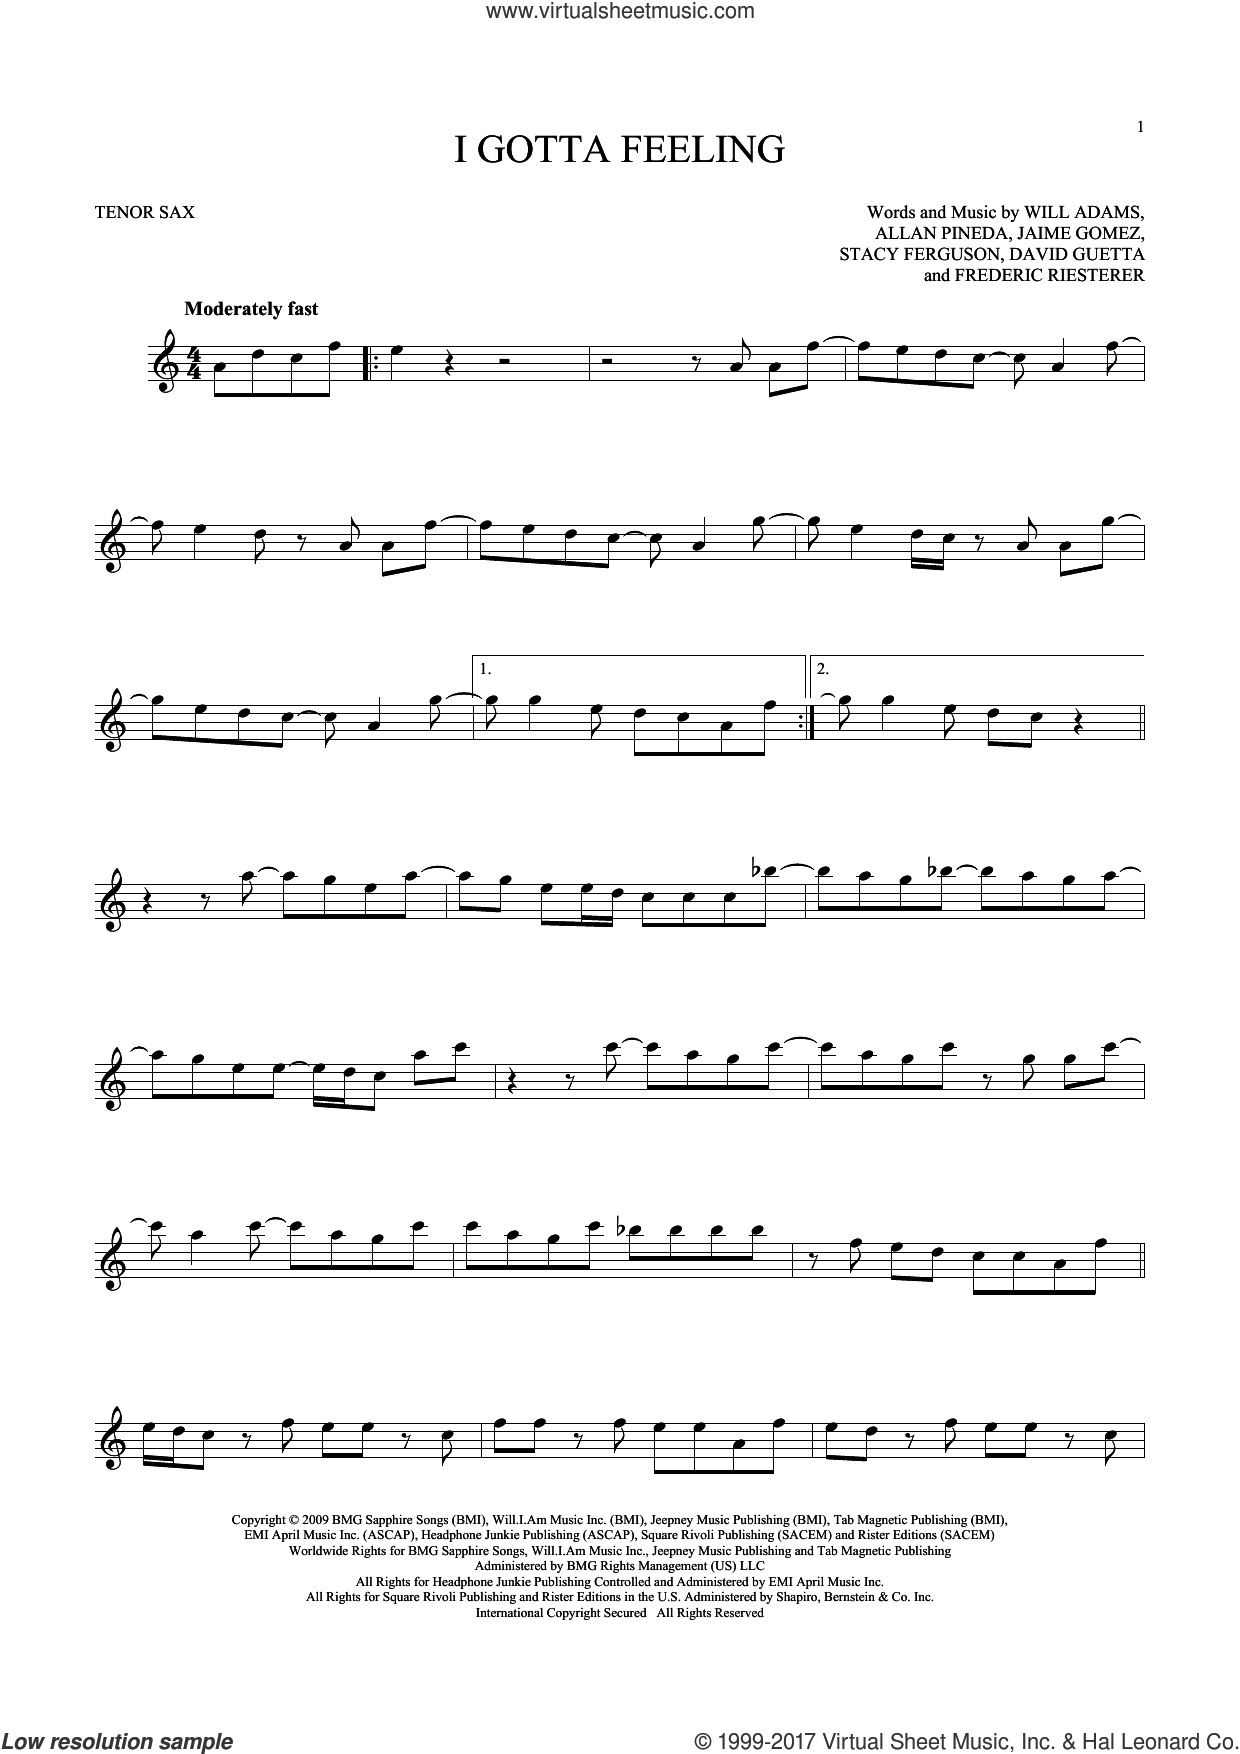 I Gotta Feeling sheet music for tenor saxophone solo by Will Adams, Black Eyed Peas, Allan Pineda, David Guetta, Frederic Riesterer, Jaime Gomez and Stacy Ferguson, intermediate skill level